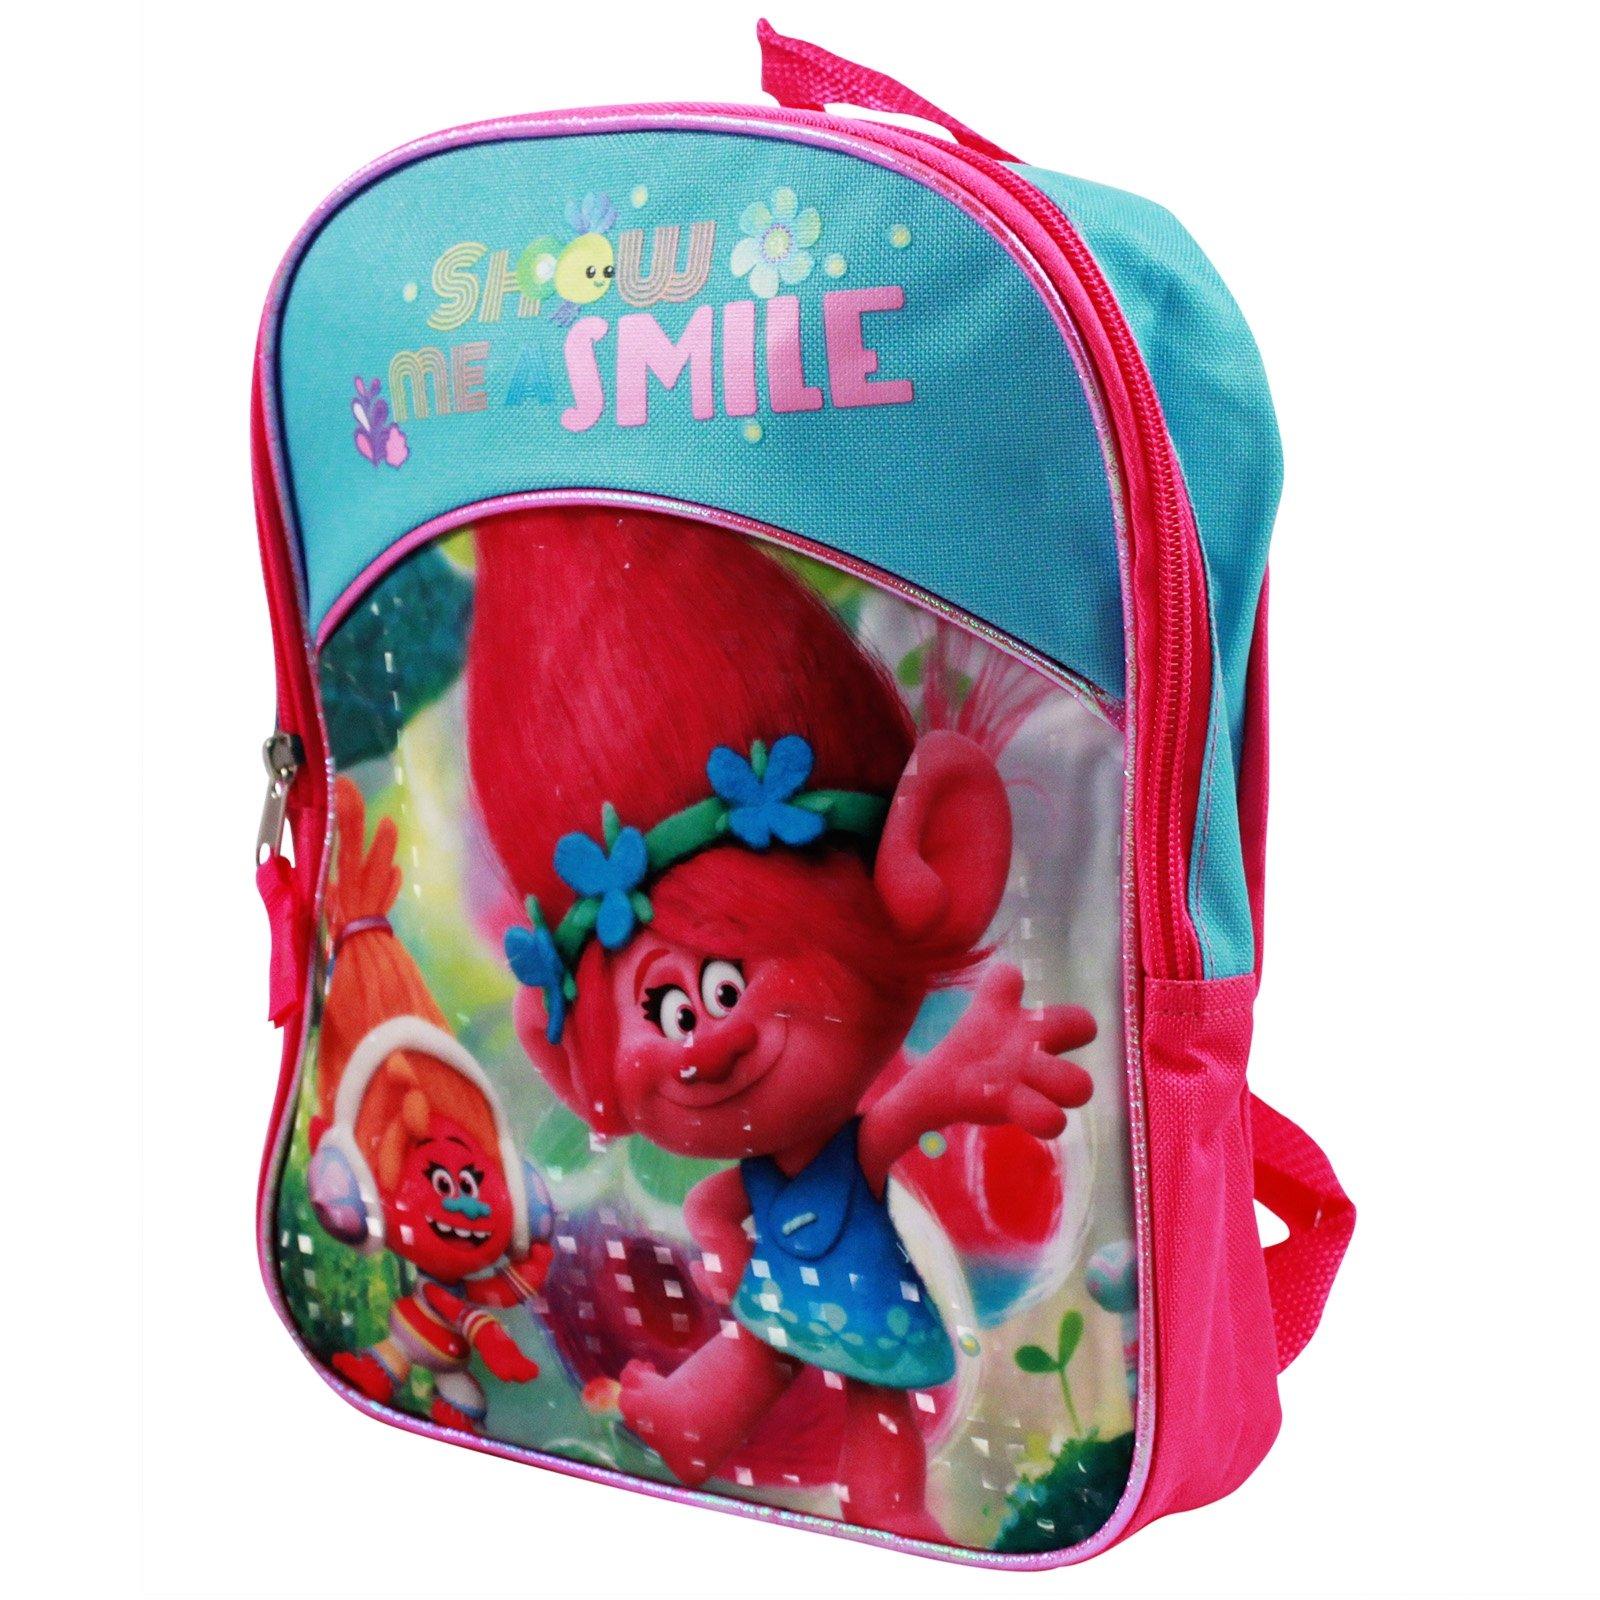 Dreamworks Trolls Princess Poppy and DJ Suki Show me a Smile Girls Backpack